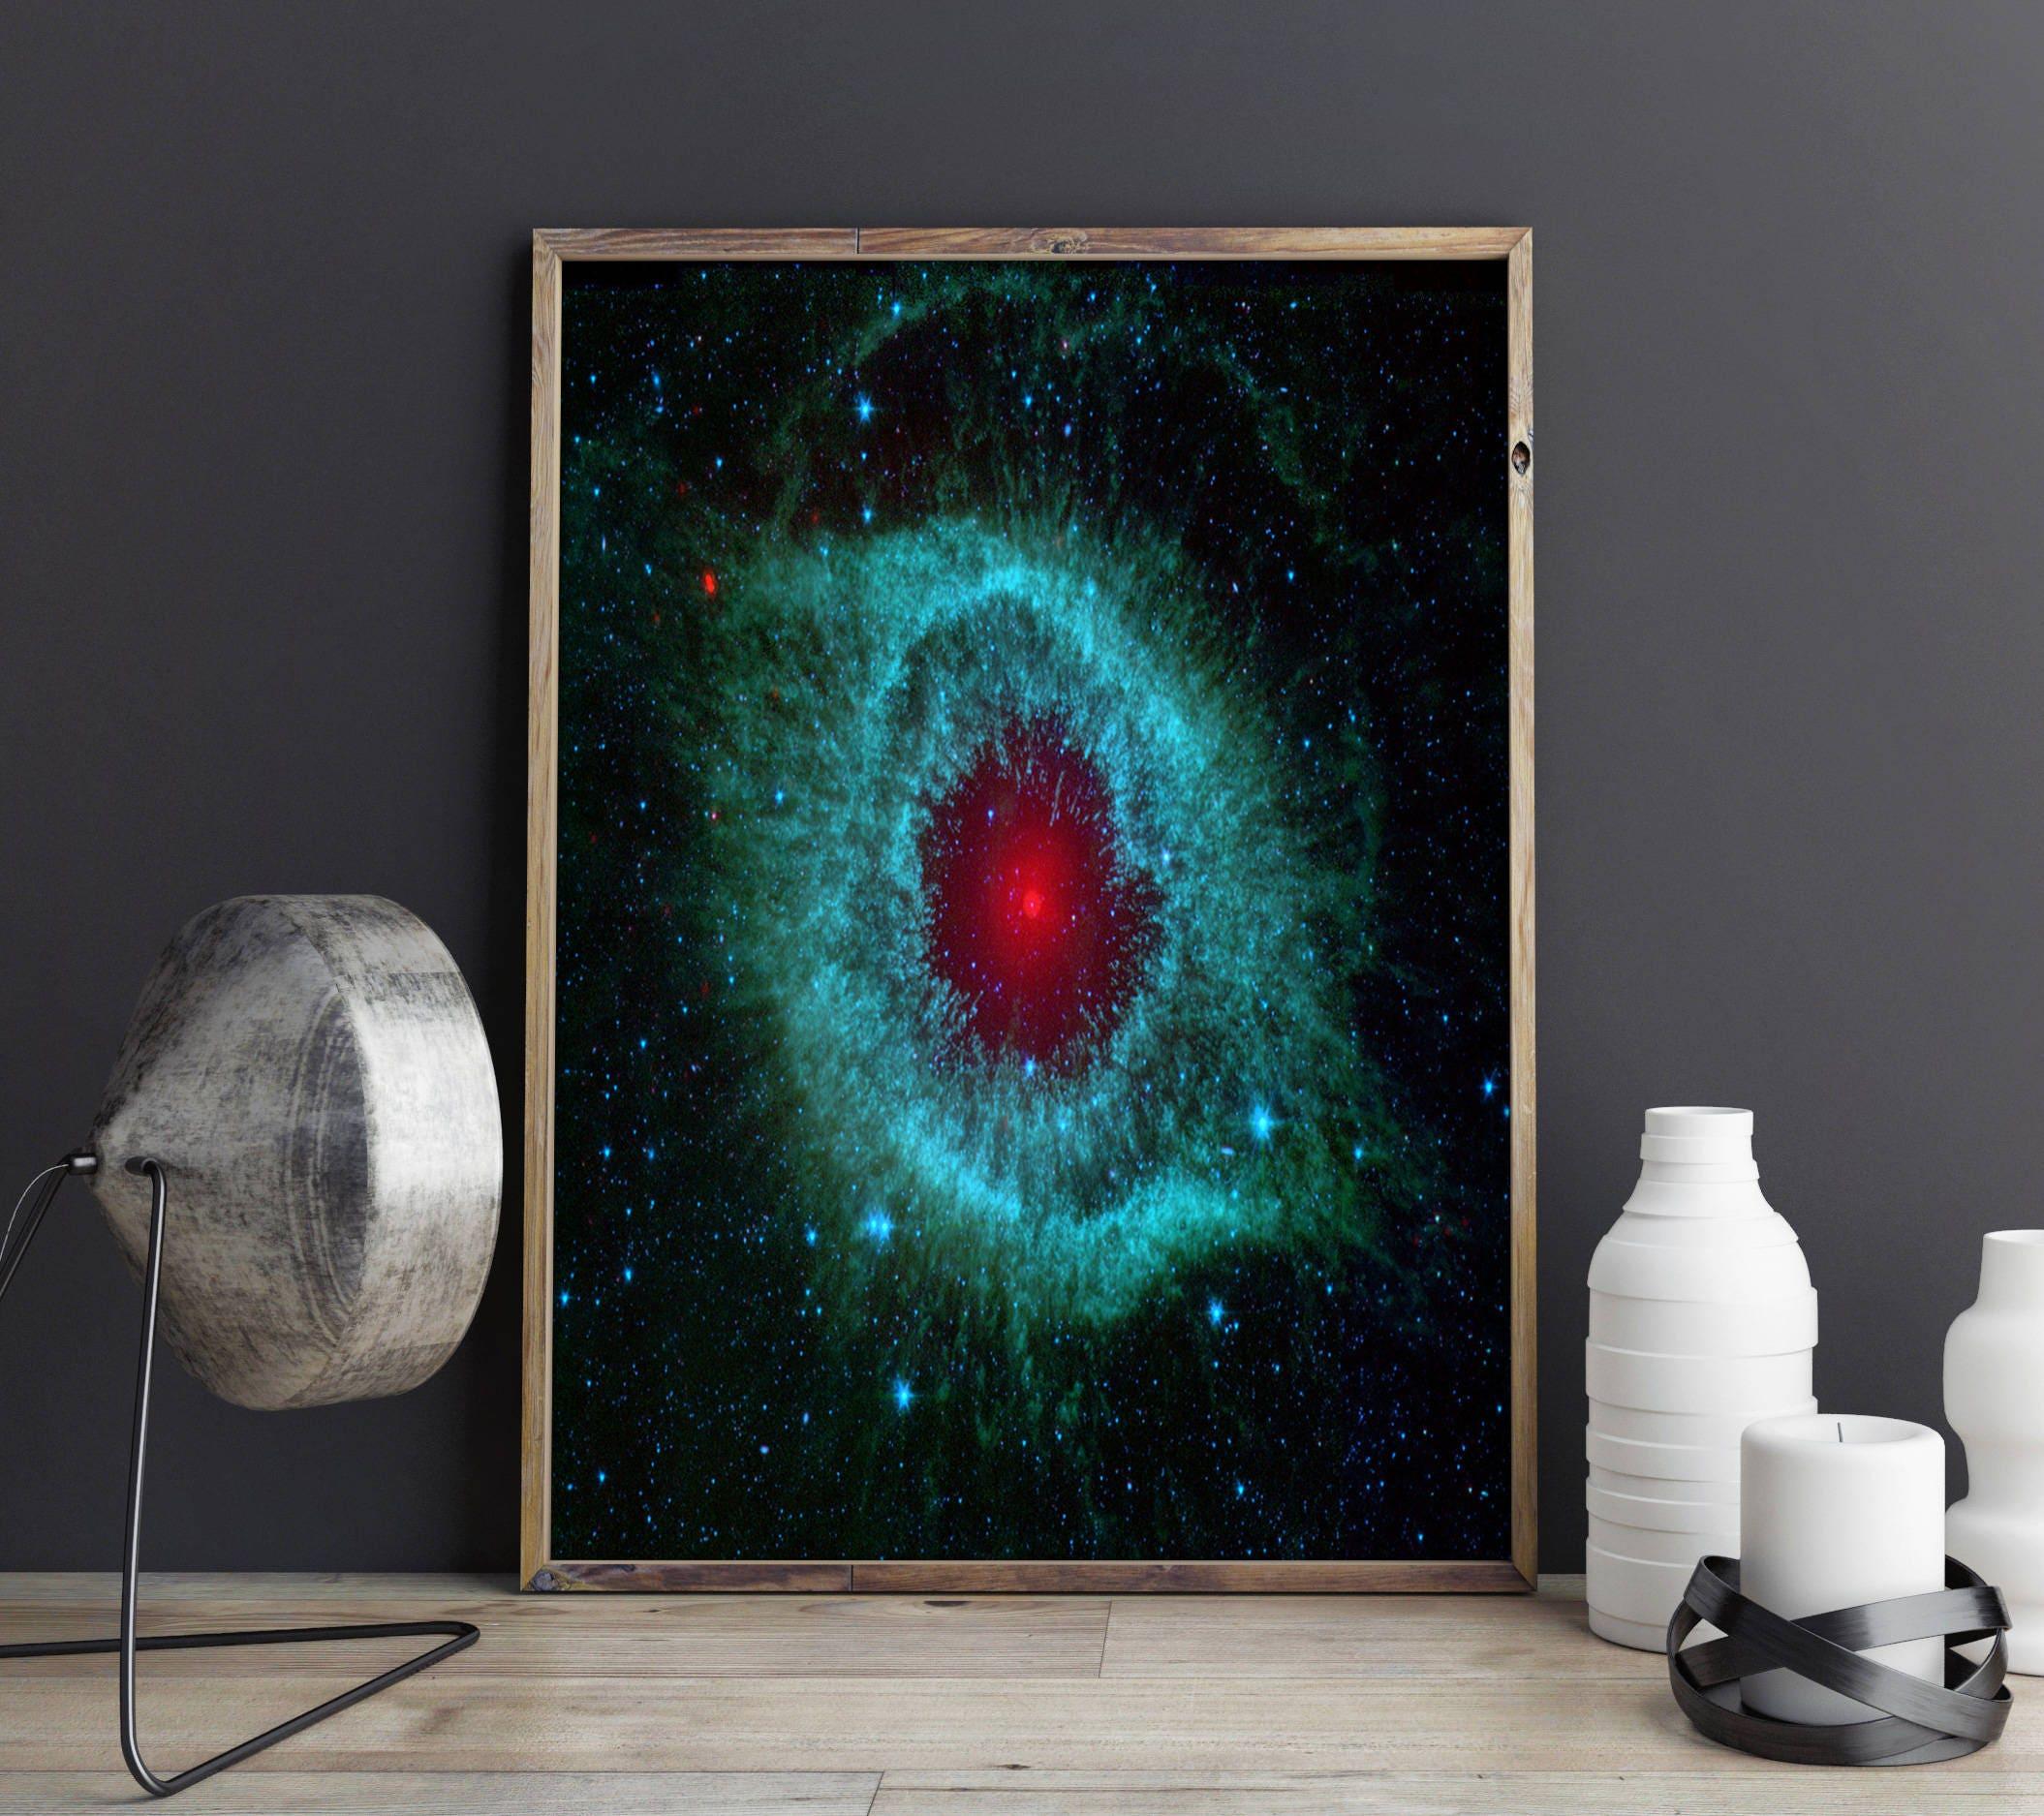 hubble outer space poster nebula poster nebula photo hubble photo